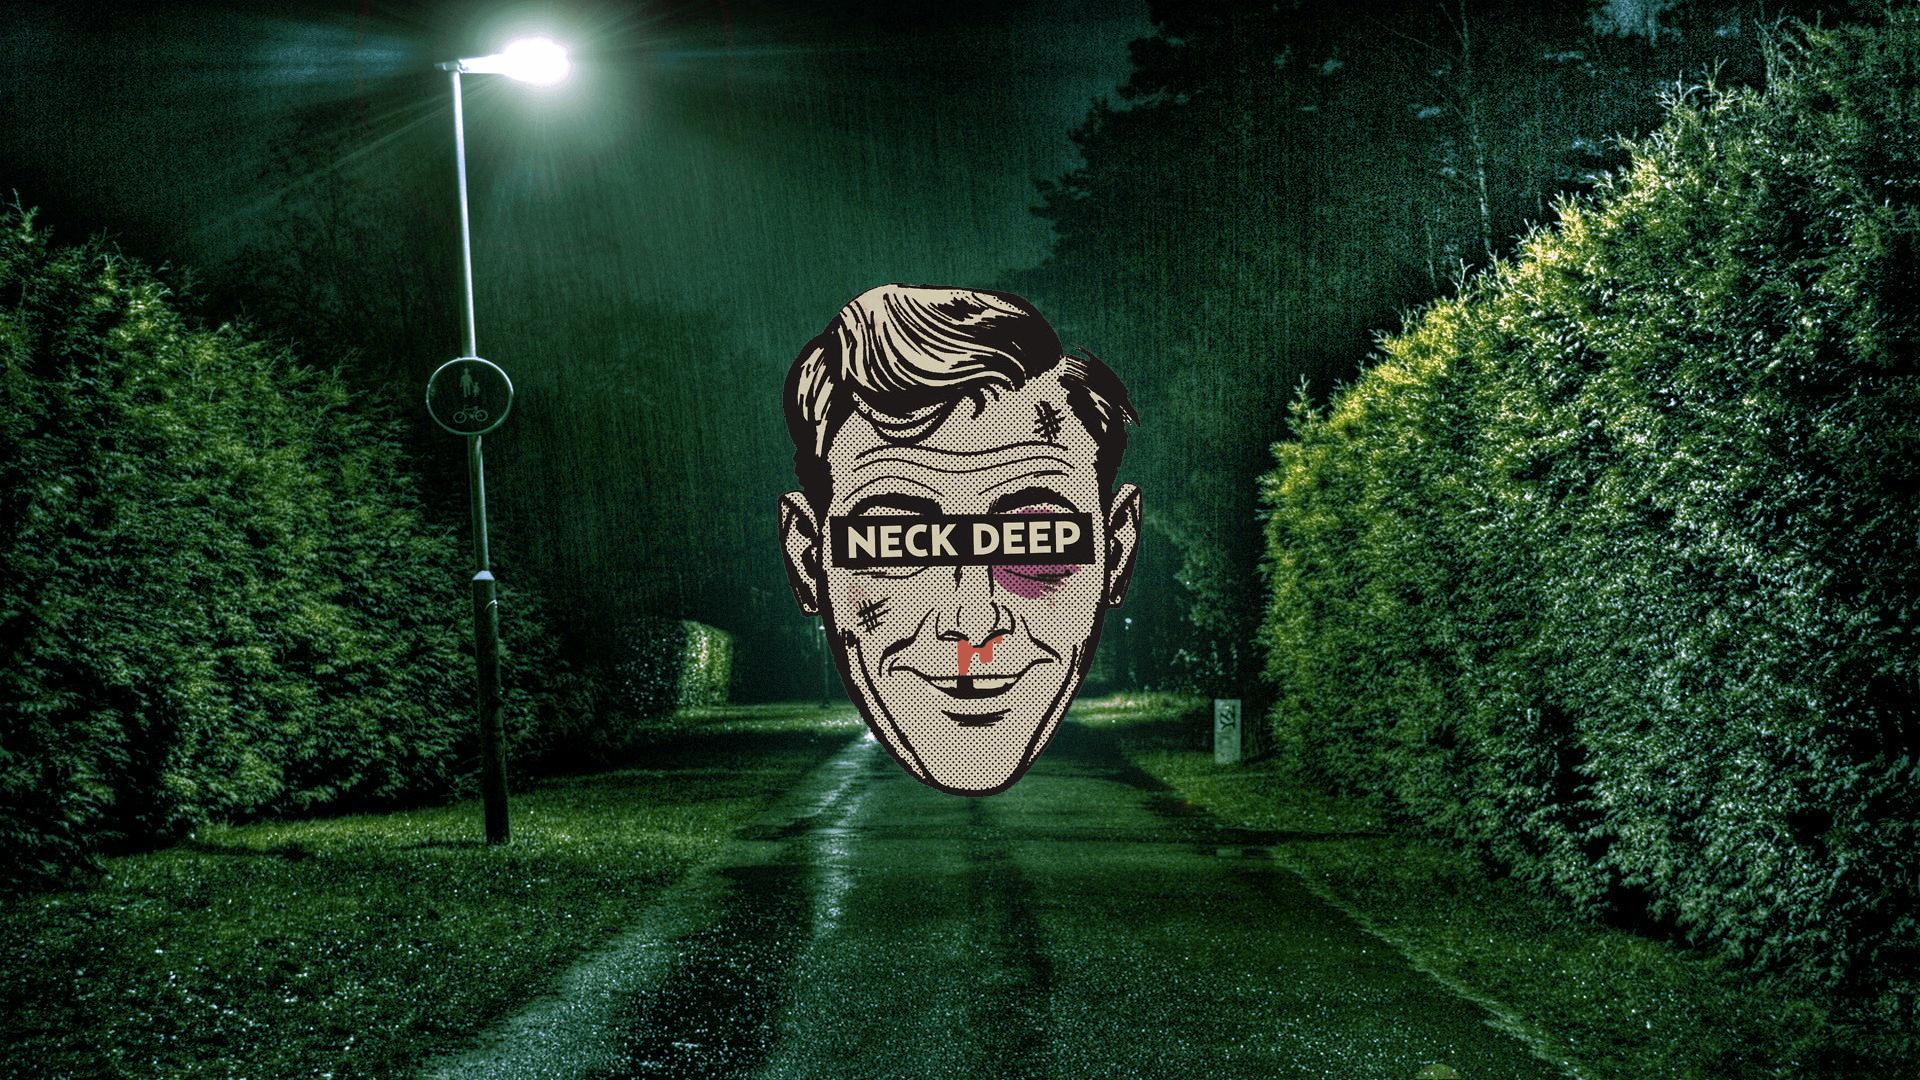 Neck Deep Wallpaper By Finallyakilljoy On DeviantArt